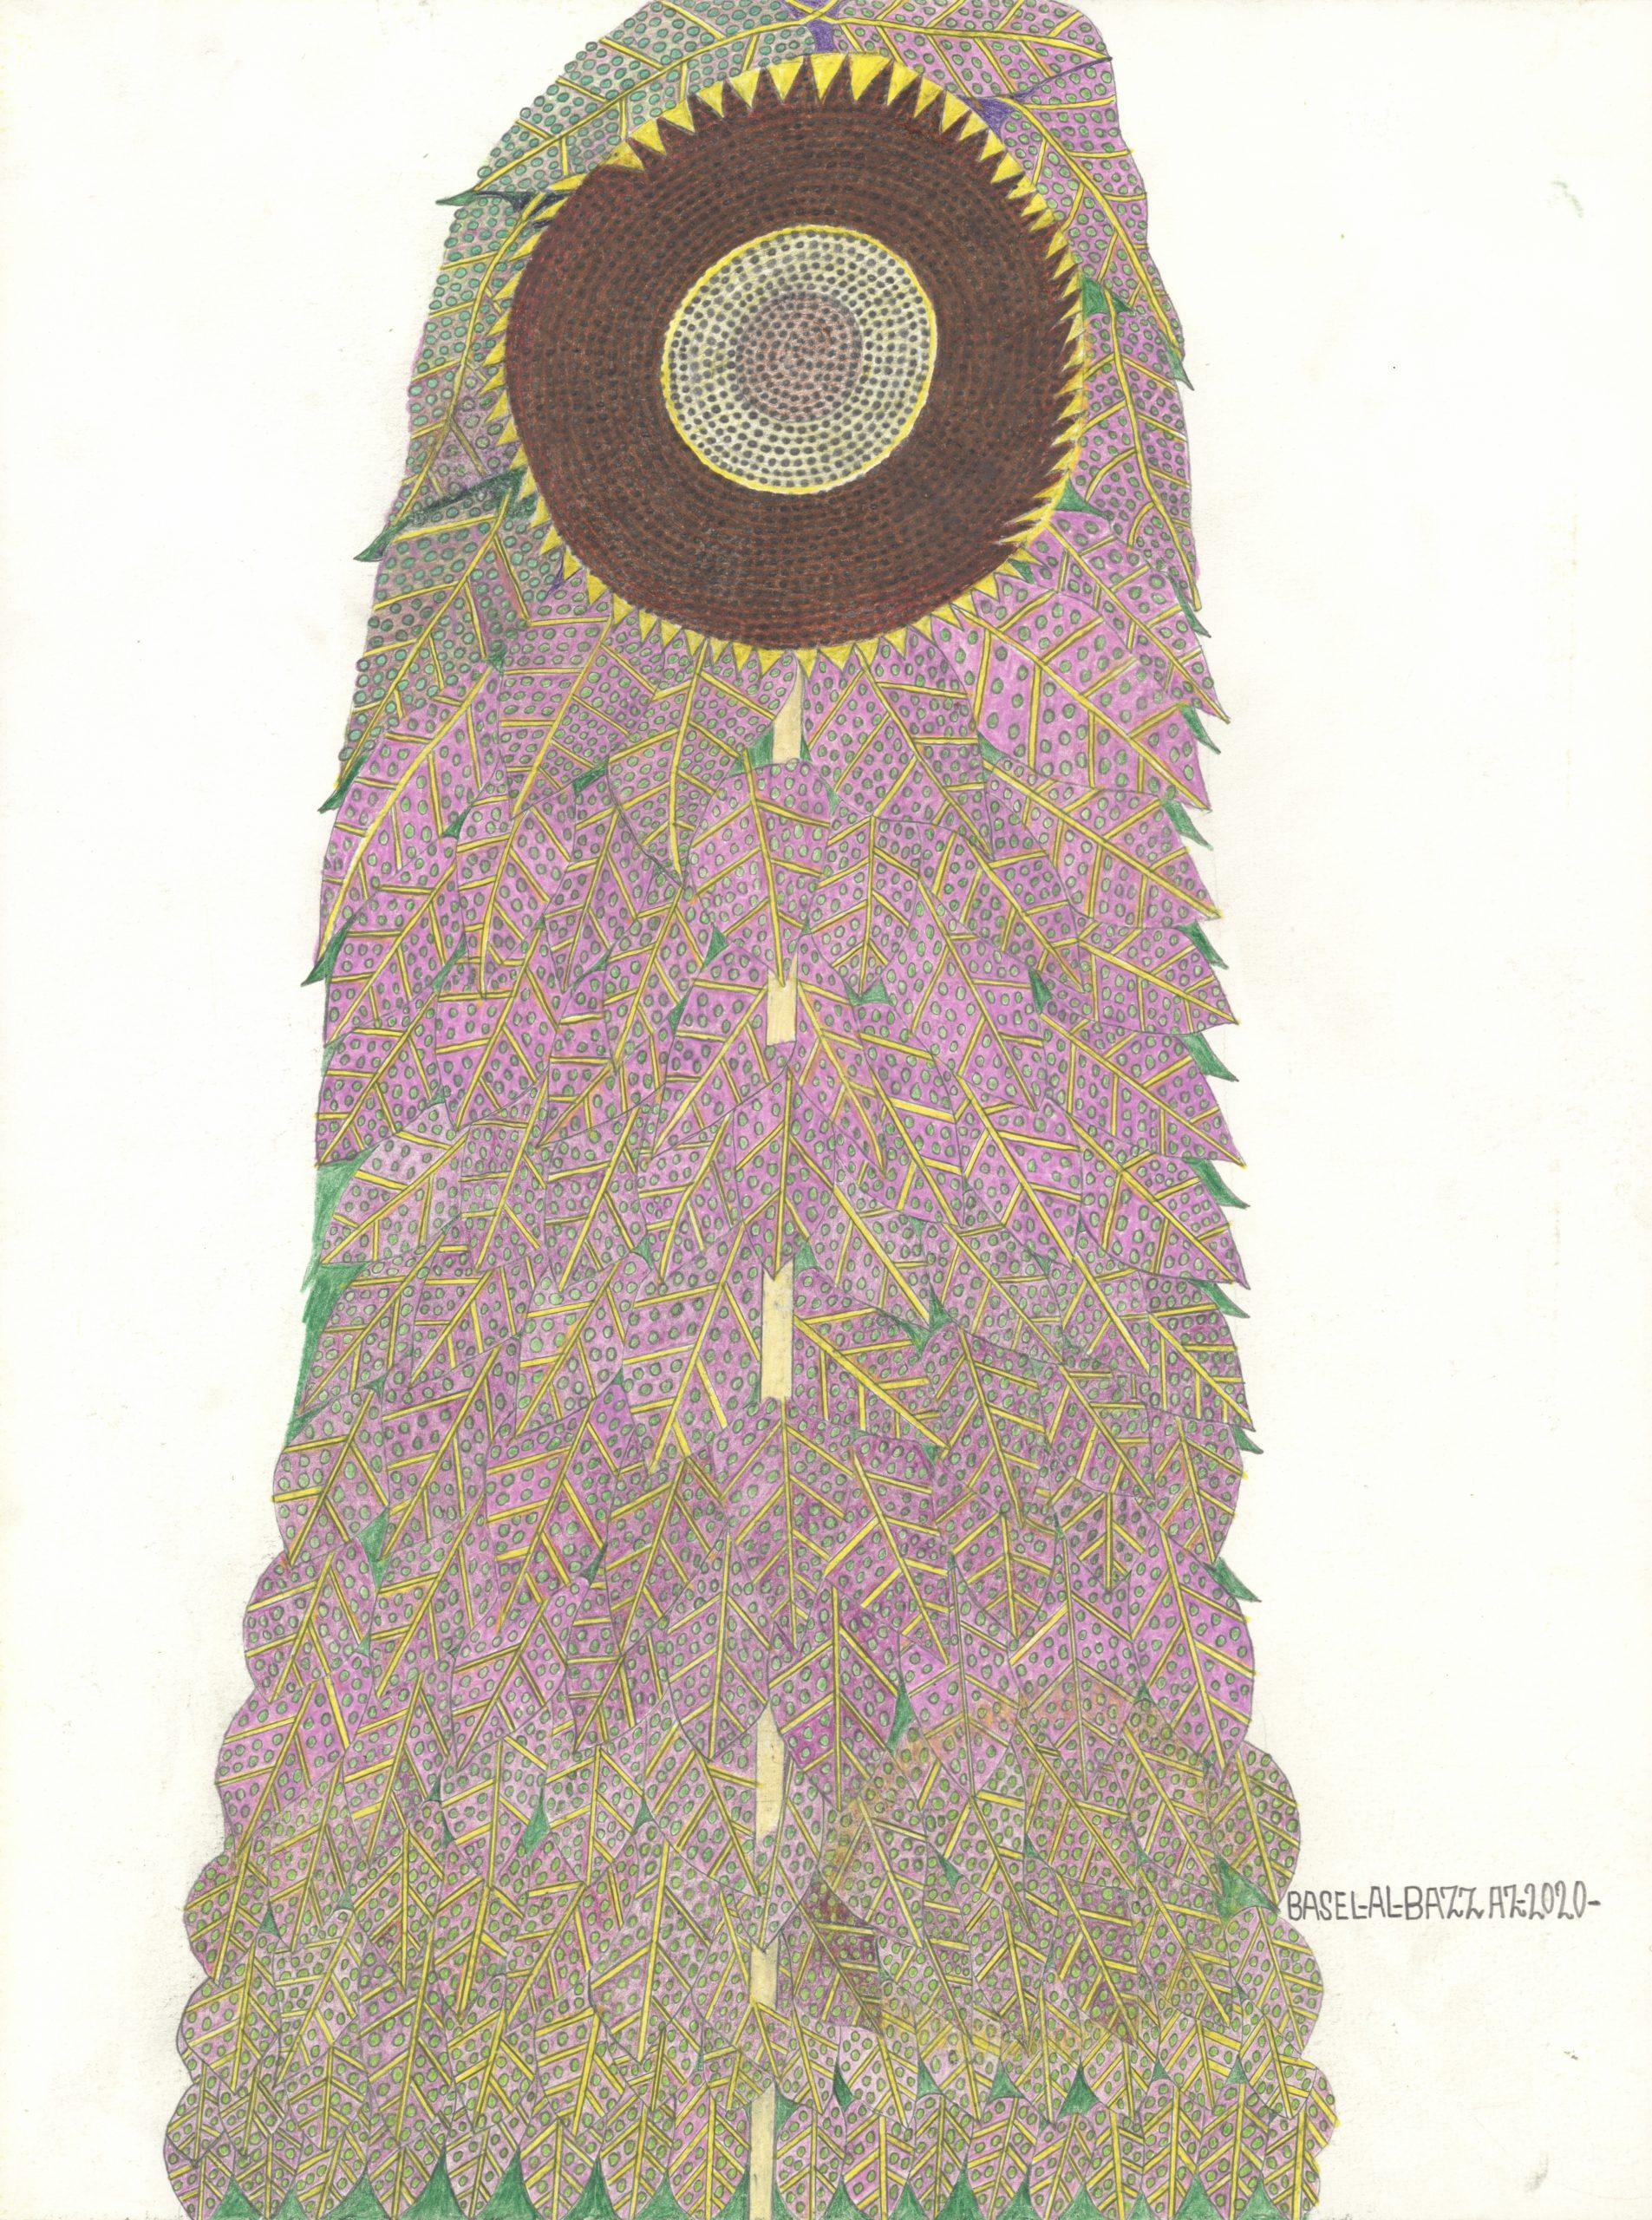 al-bazzaz basel - Blume im Kleid / Flower in dress